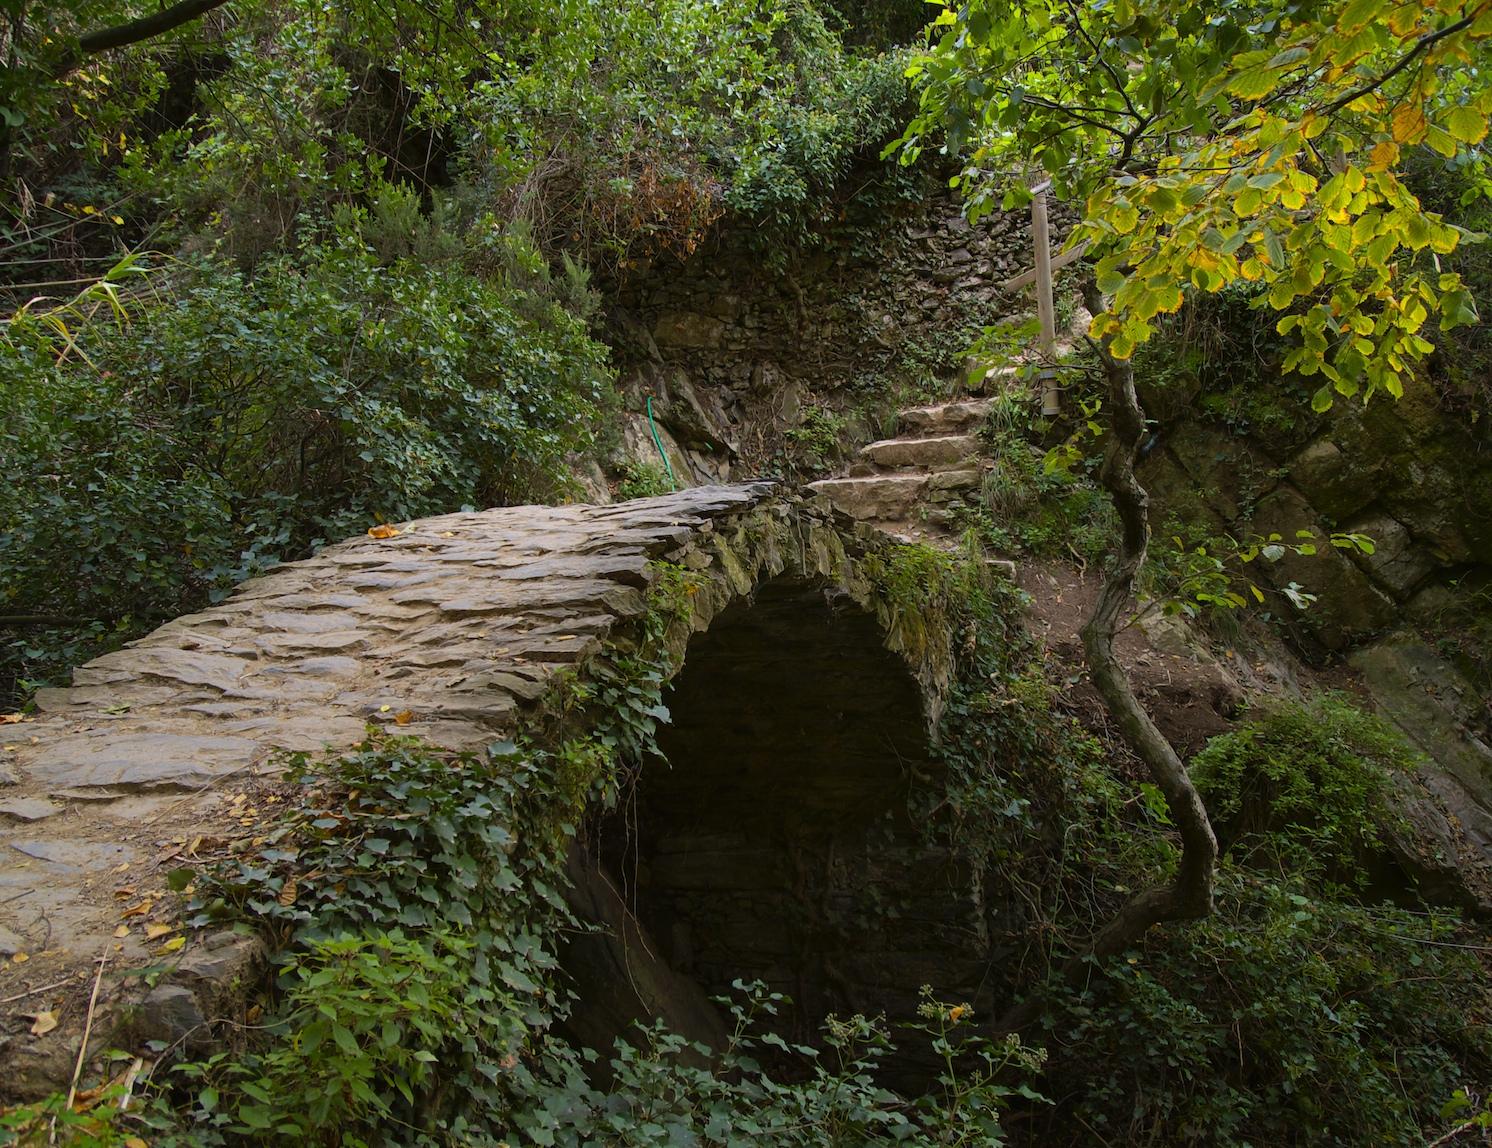 cinque trail ponte1.jpg